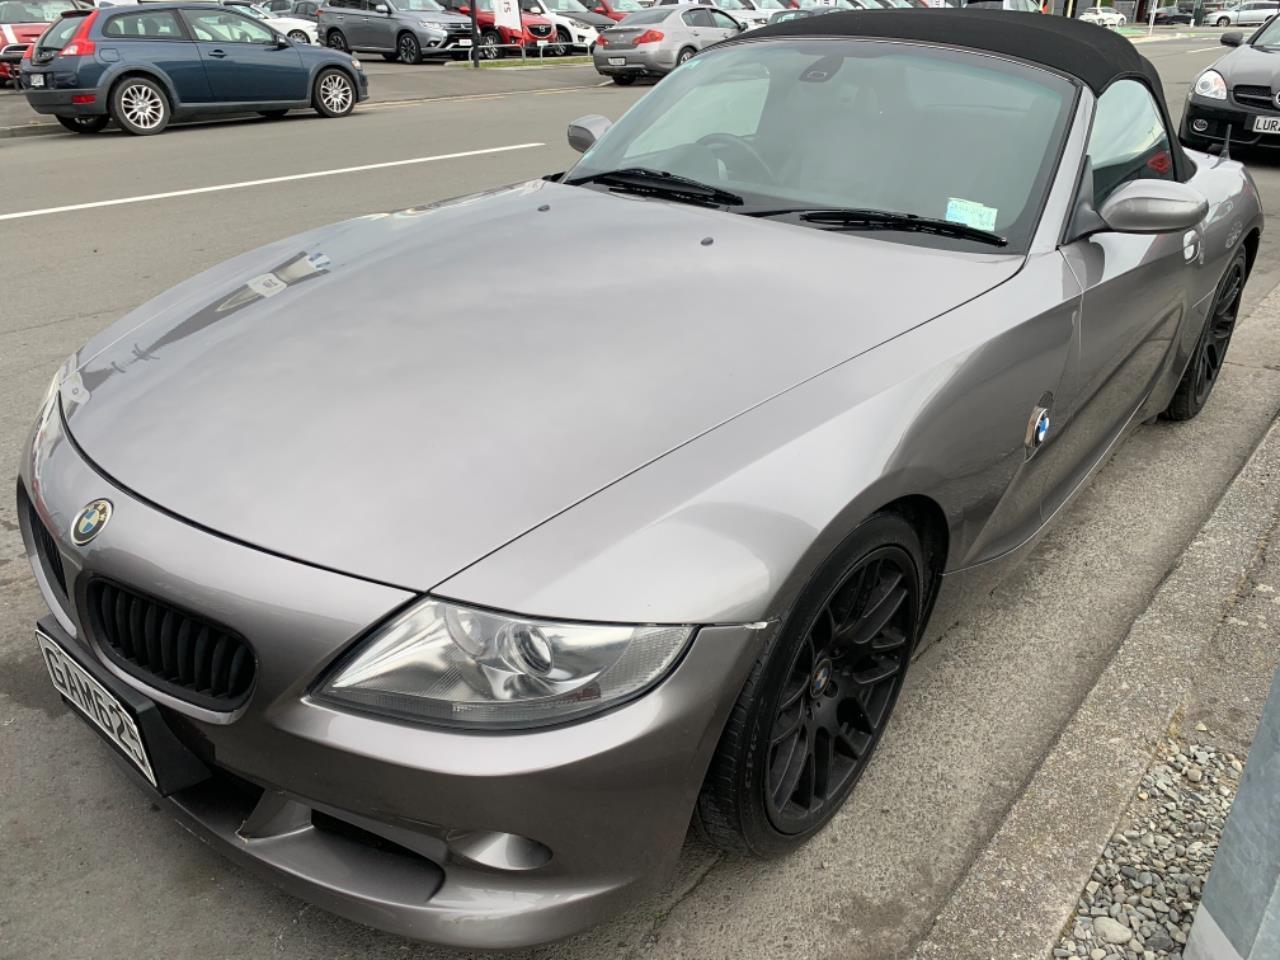 image-1, 2005 BMW Z4 at Christchurch